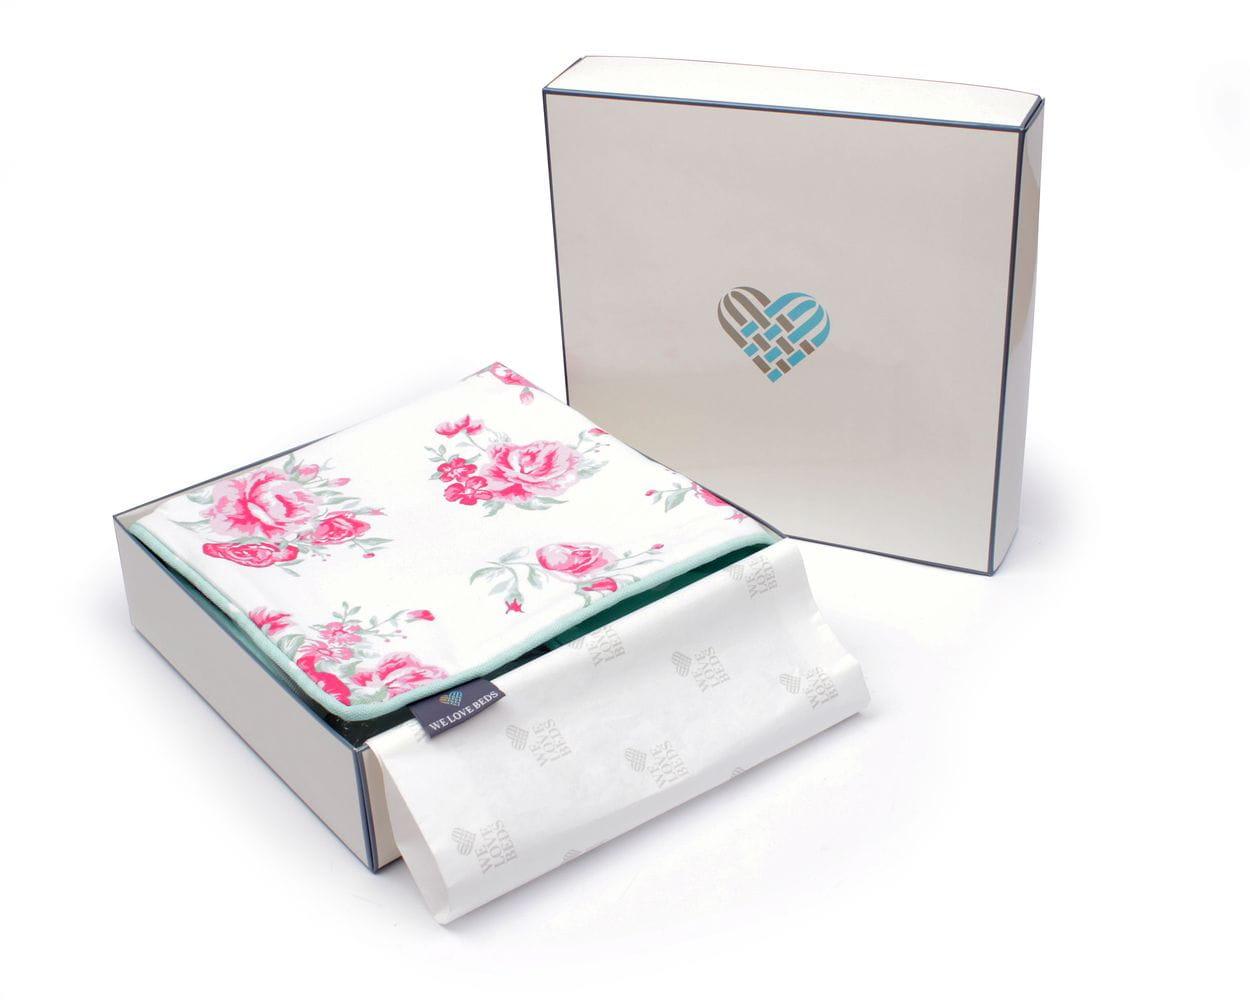 Poduszka dekoracyjna Roses Mint 40x60 cm - We Love Candles&We Love Beds